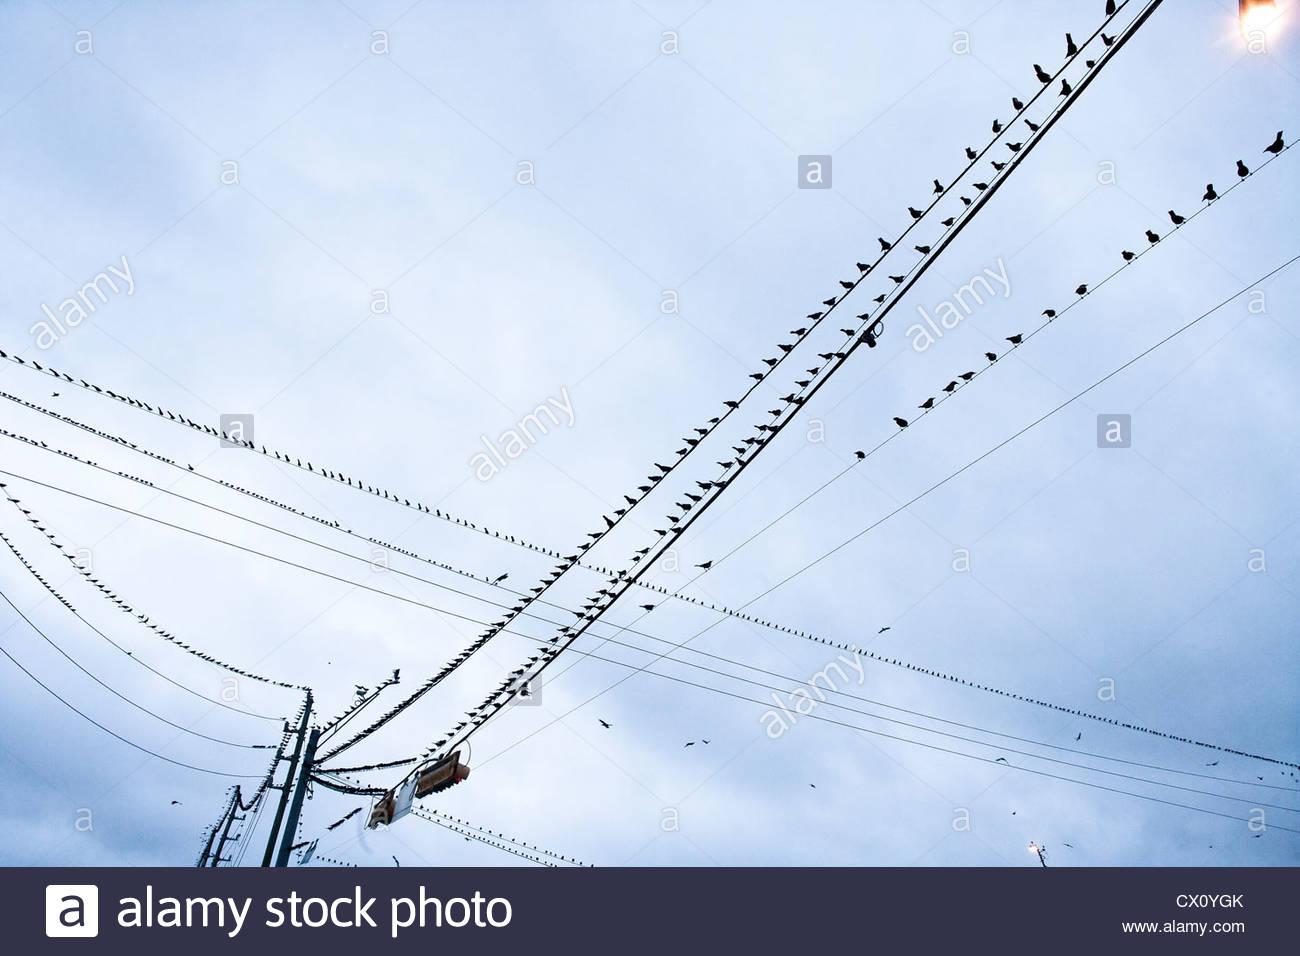 Birds On Telephone Wire Stock Photos & Birds On Telephone Wire Stock ...